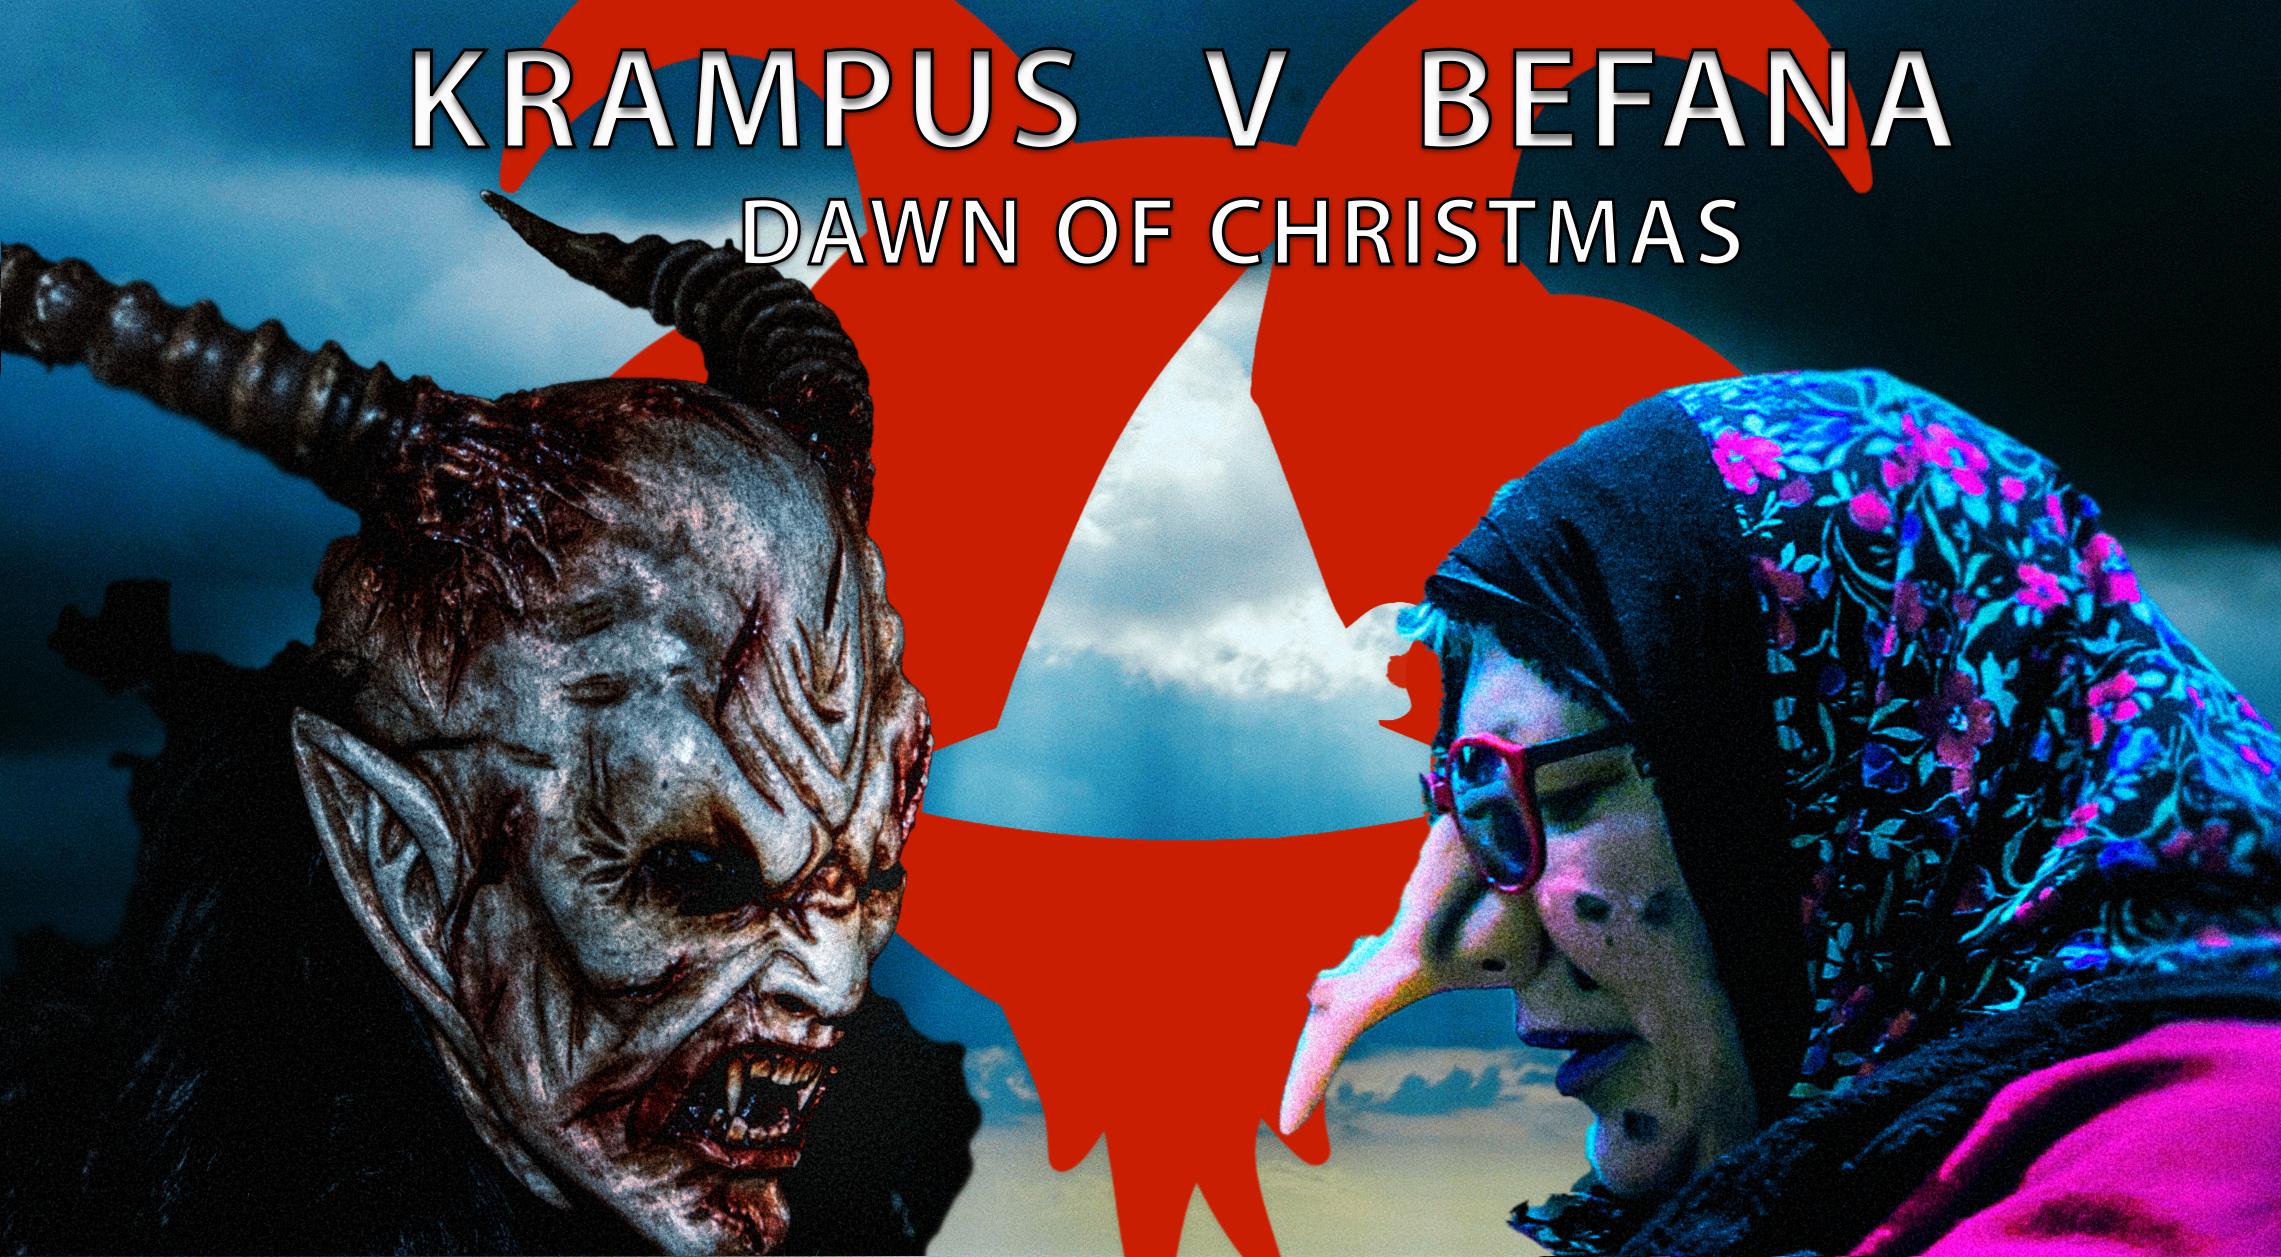 Krampus v Befana fake movie banner